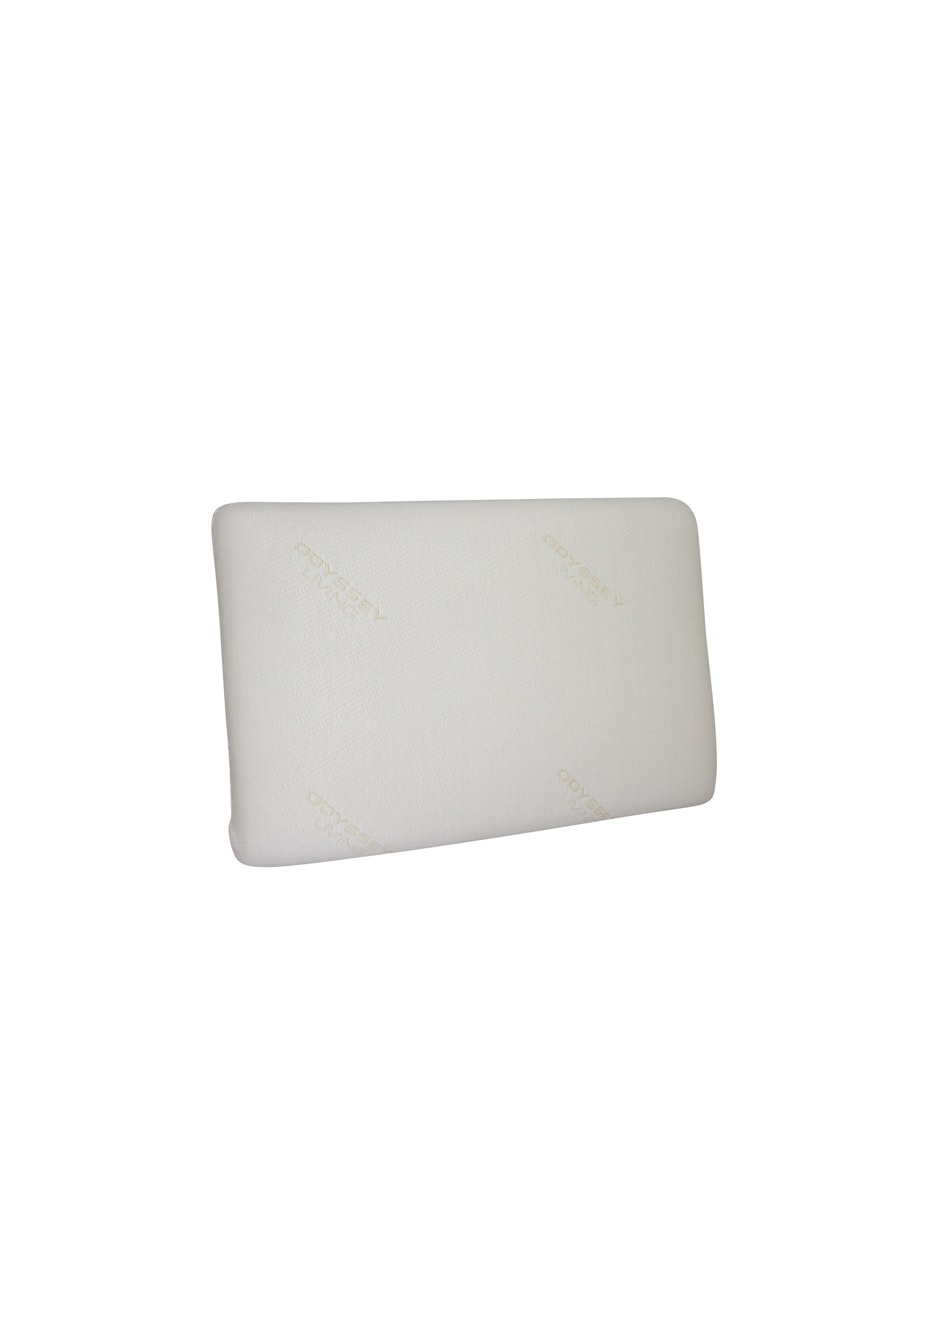 Memory Foam Pillow - Standard